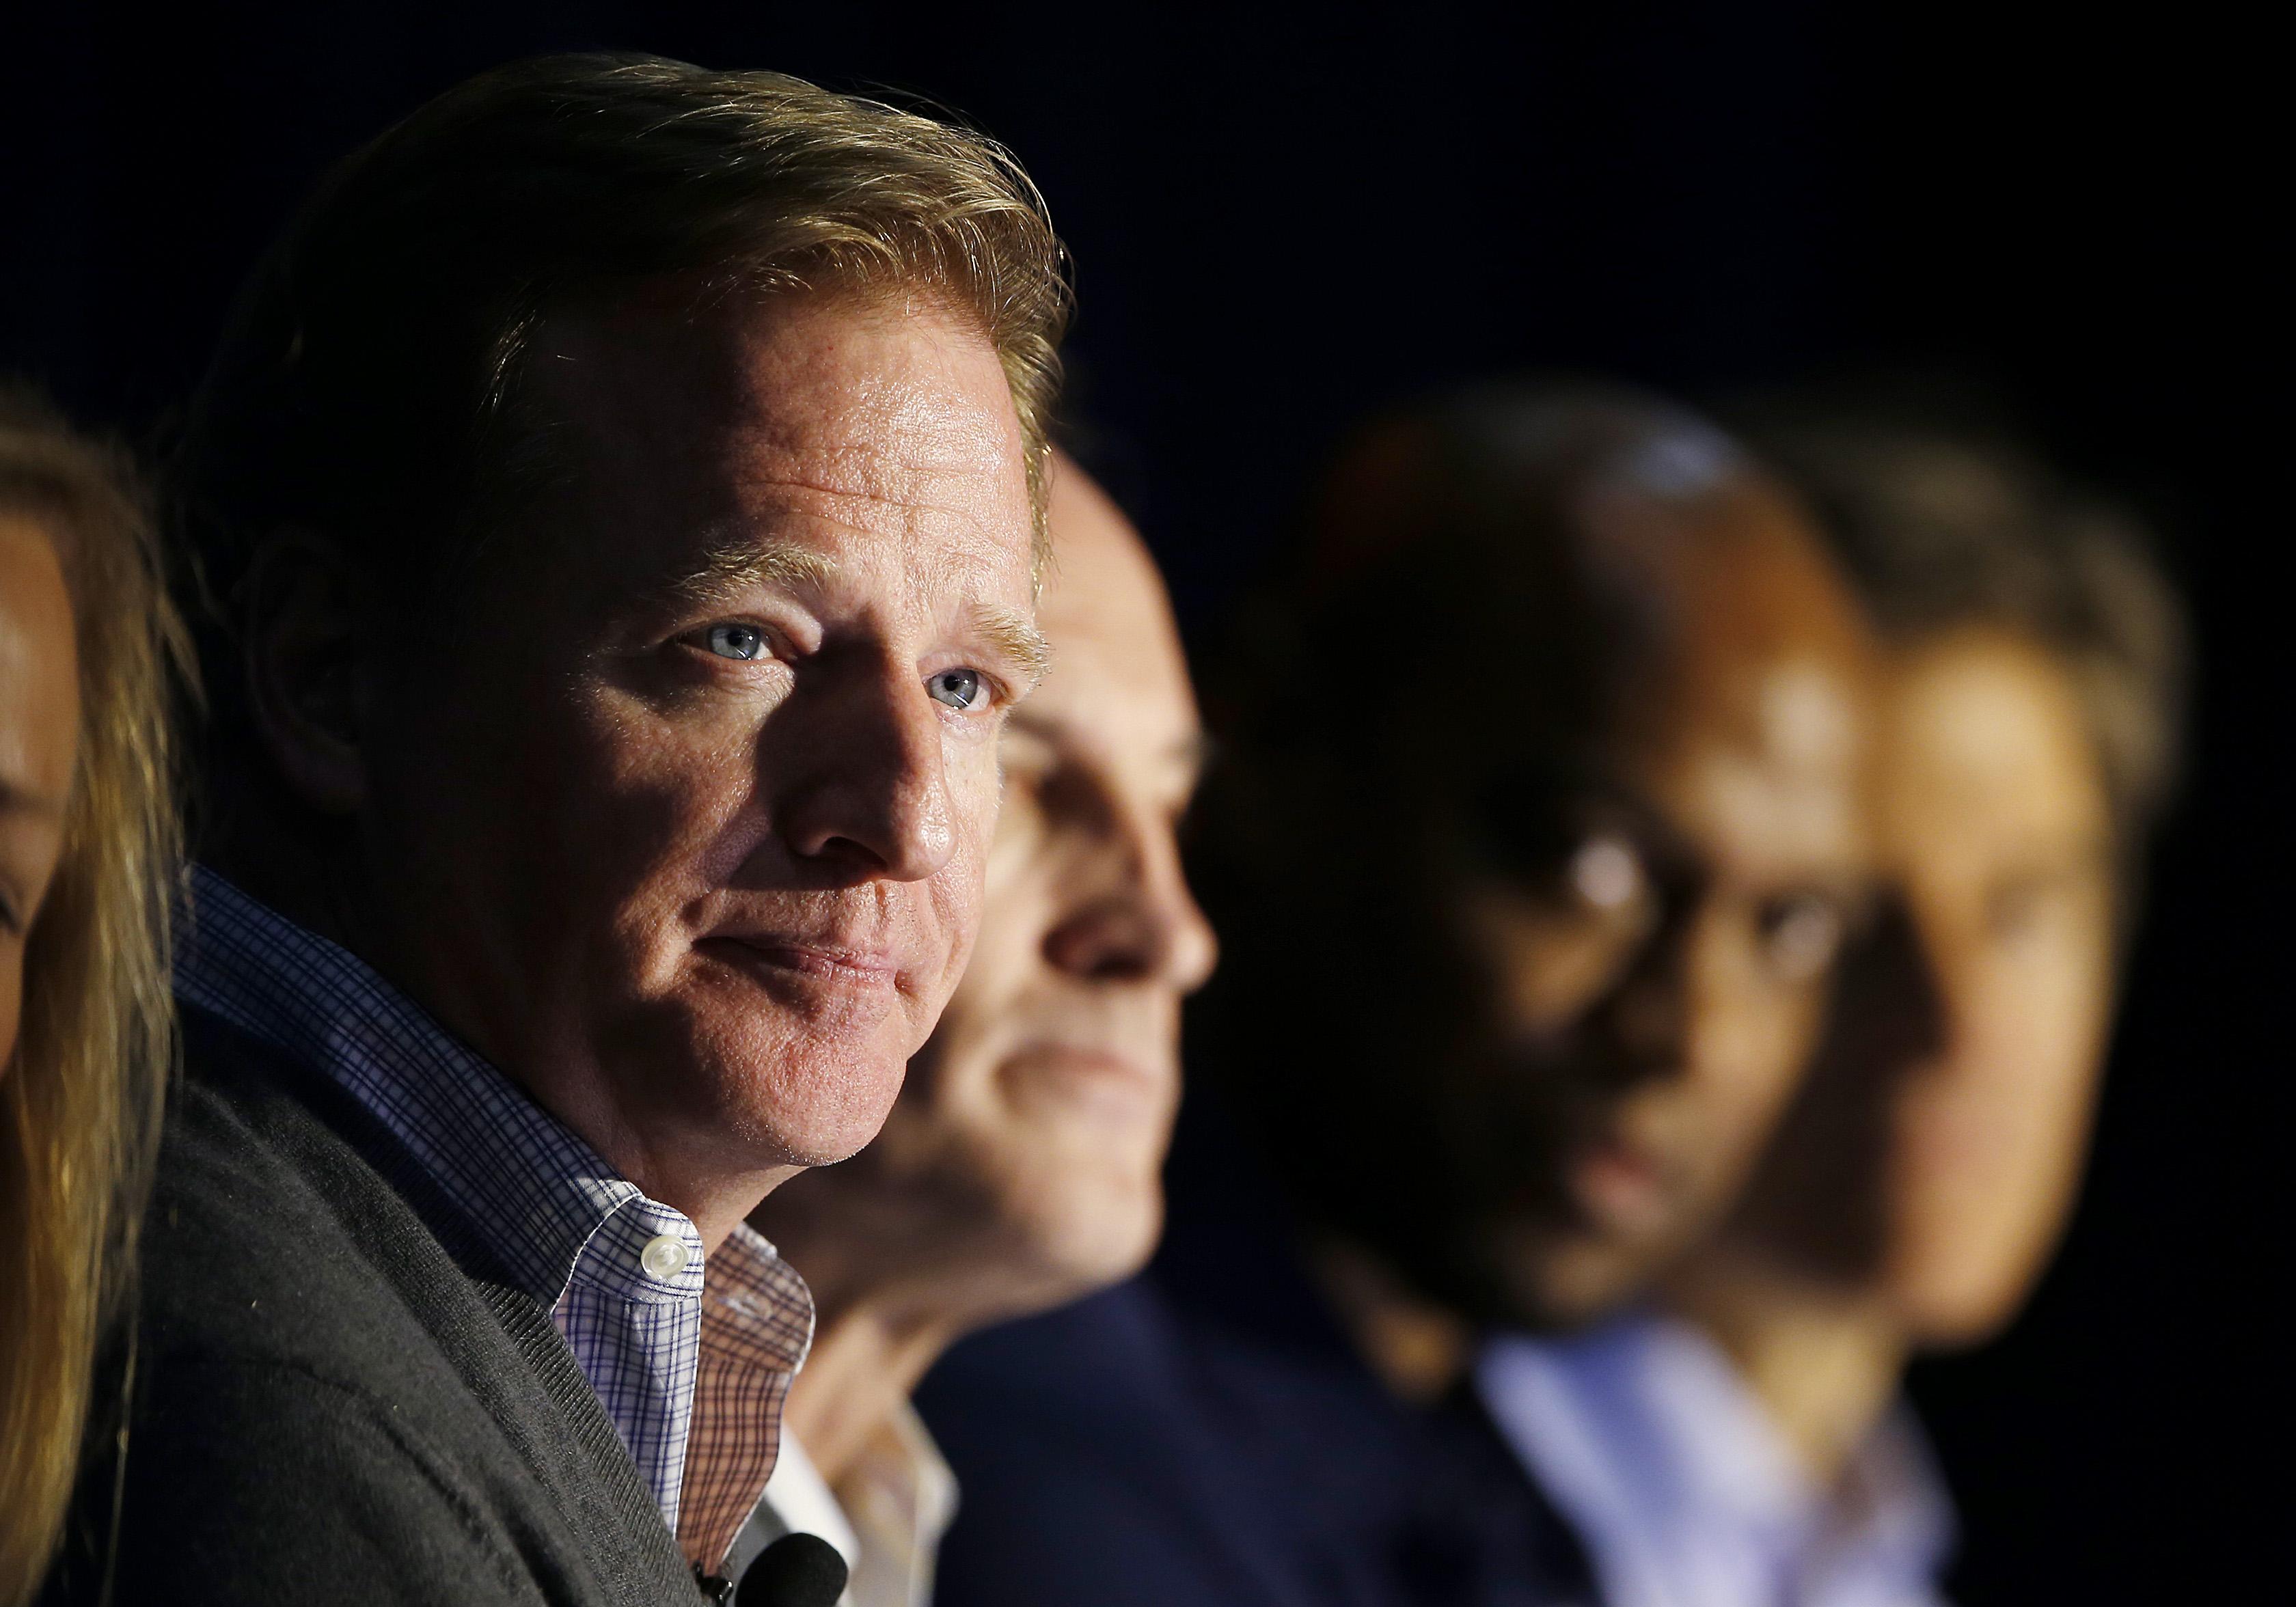 Judge approves $50M settlement in NFL retiree case